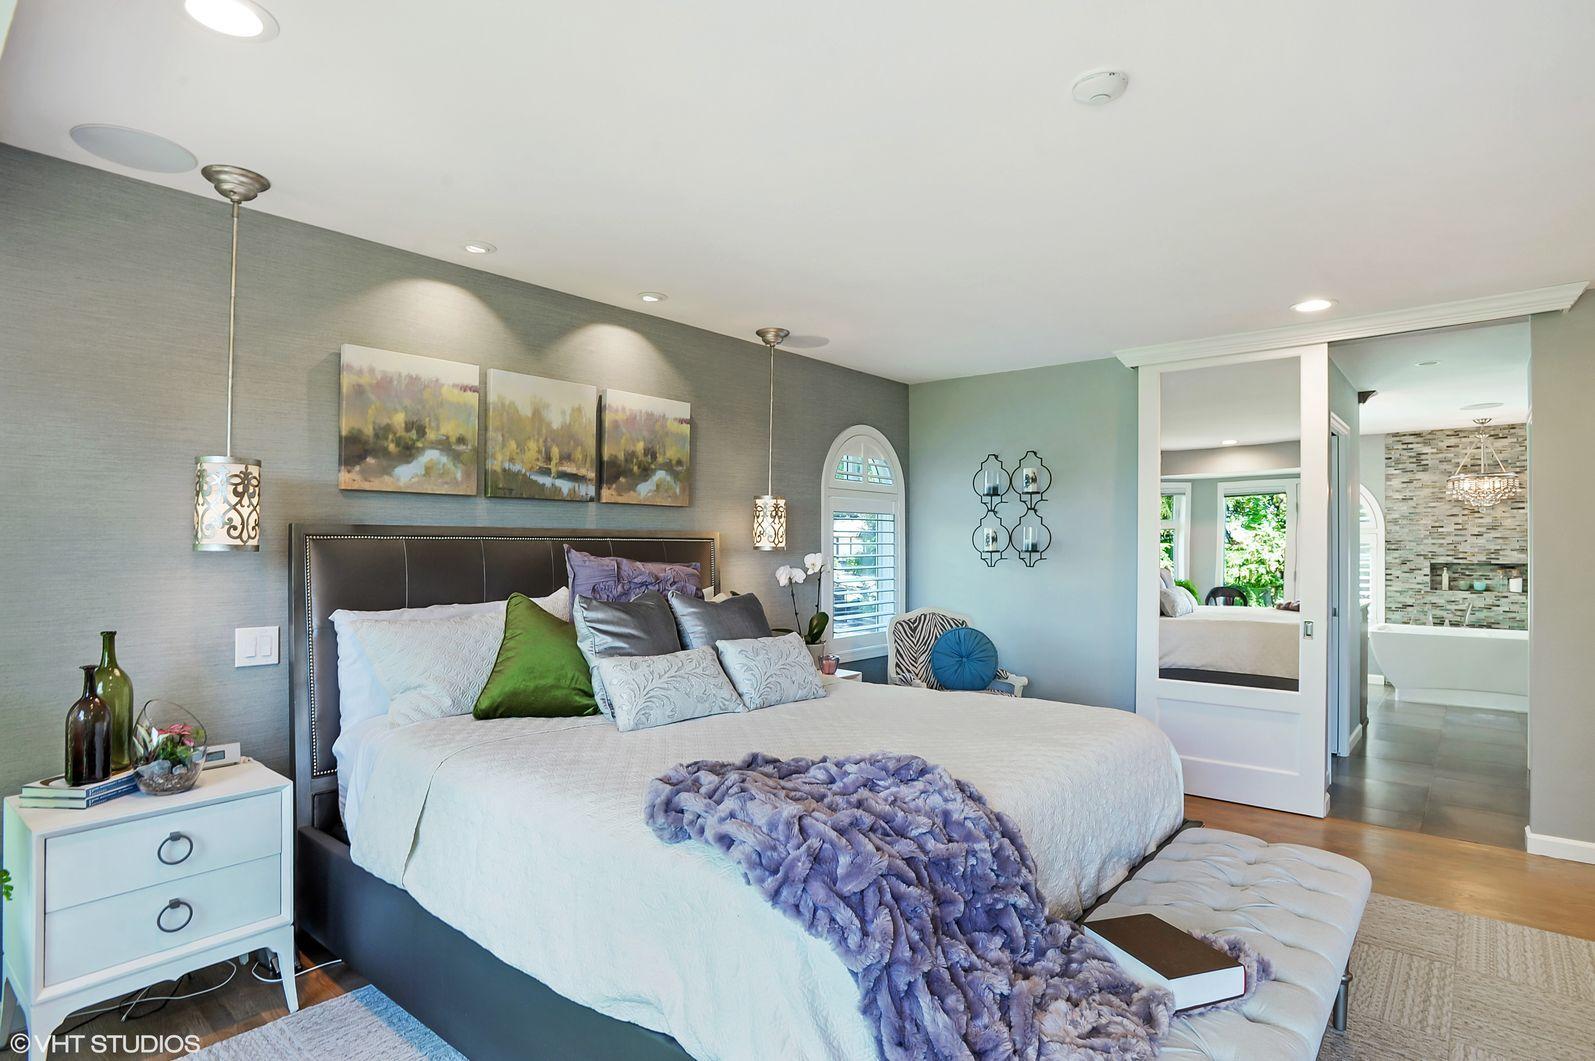 Master Bedroom Ensuite Designs Pleasing Master Bedroom Ensuite  Traditional  Bedroom  Images Decorating Design